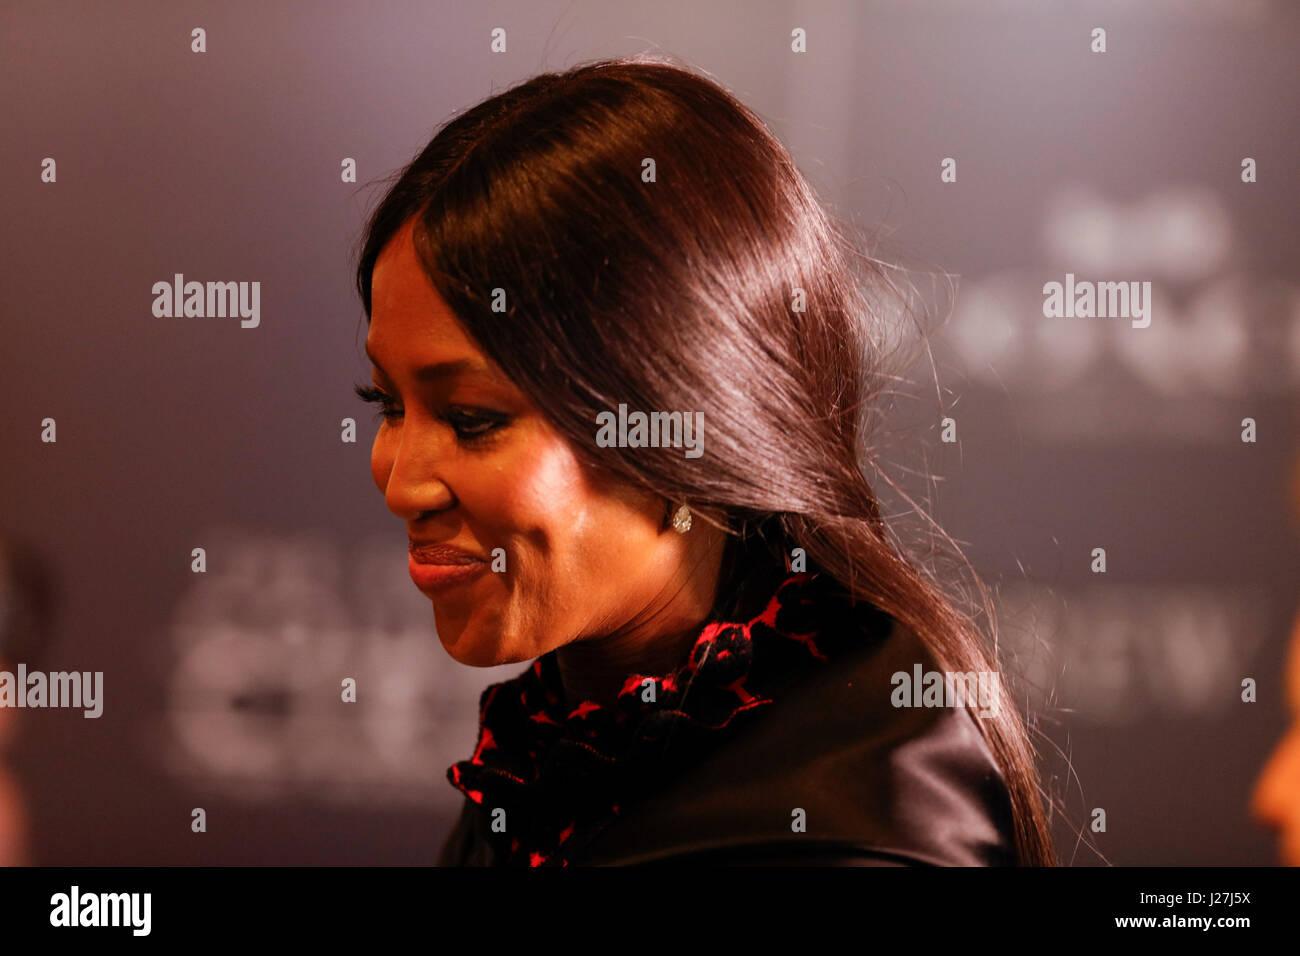 New York, USA. Apr 25, 2017. Naomi Campbell participe à la fois au Gala 2017 100 Jazz at Lincoln Center le Photo Stock